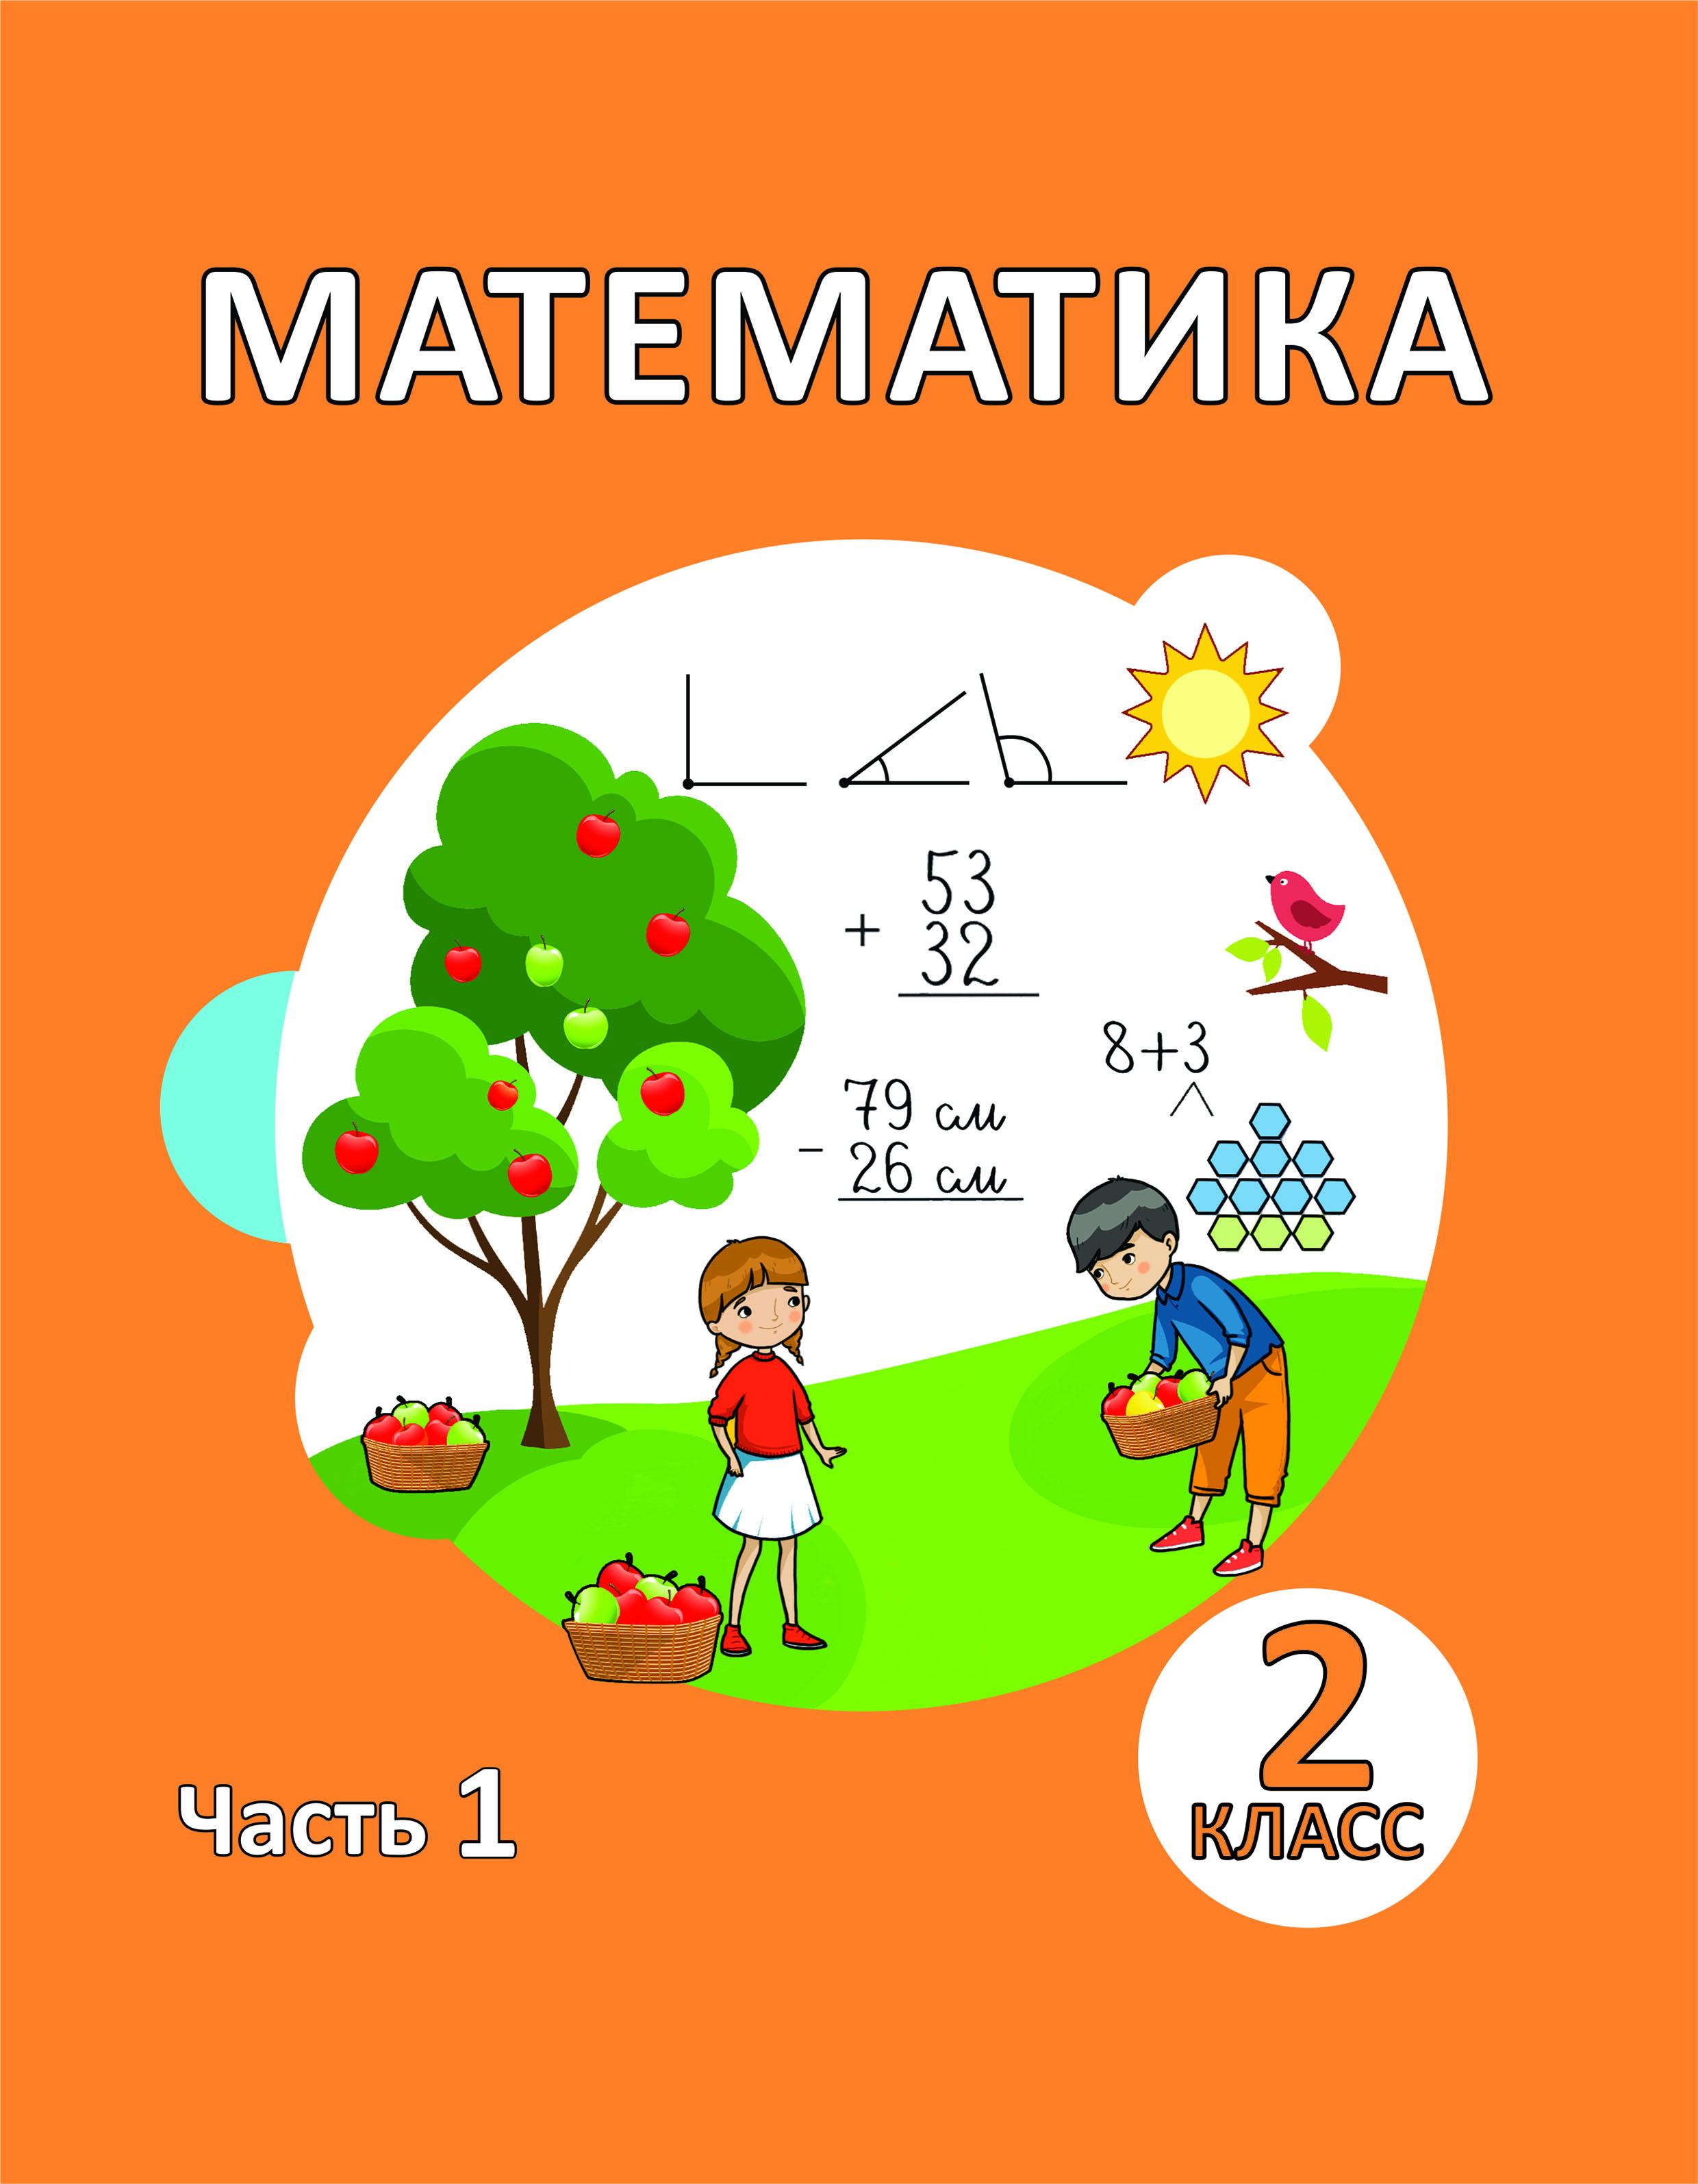 Класс 3 алматыкитап математика решебник Учебник По